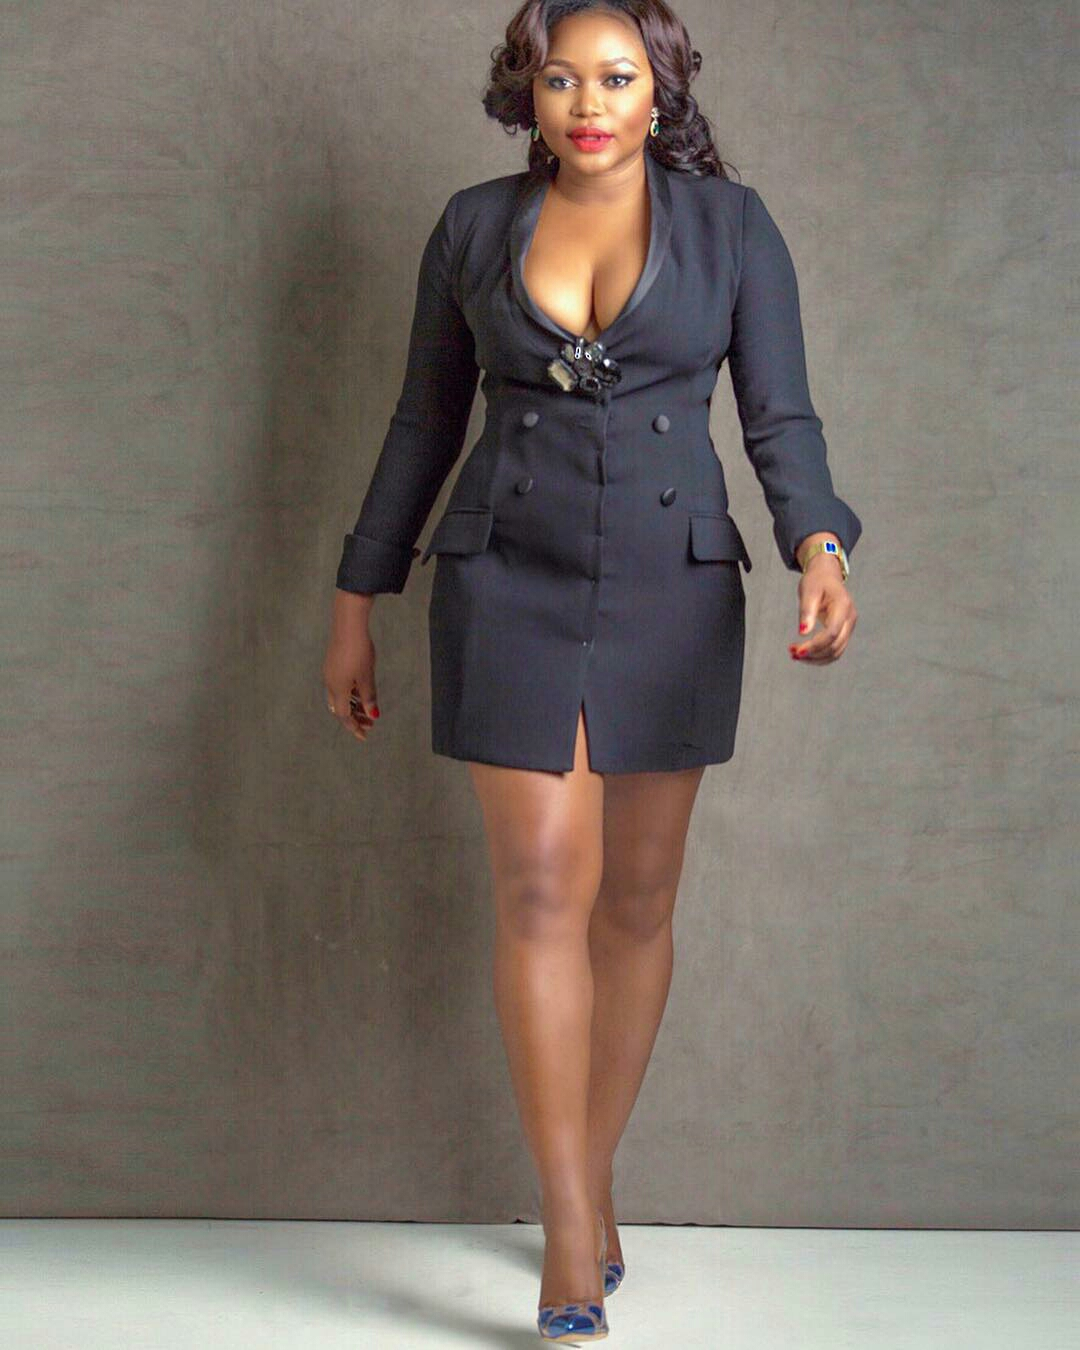 Sexy Nigerian Girls Pics